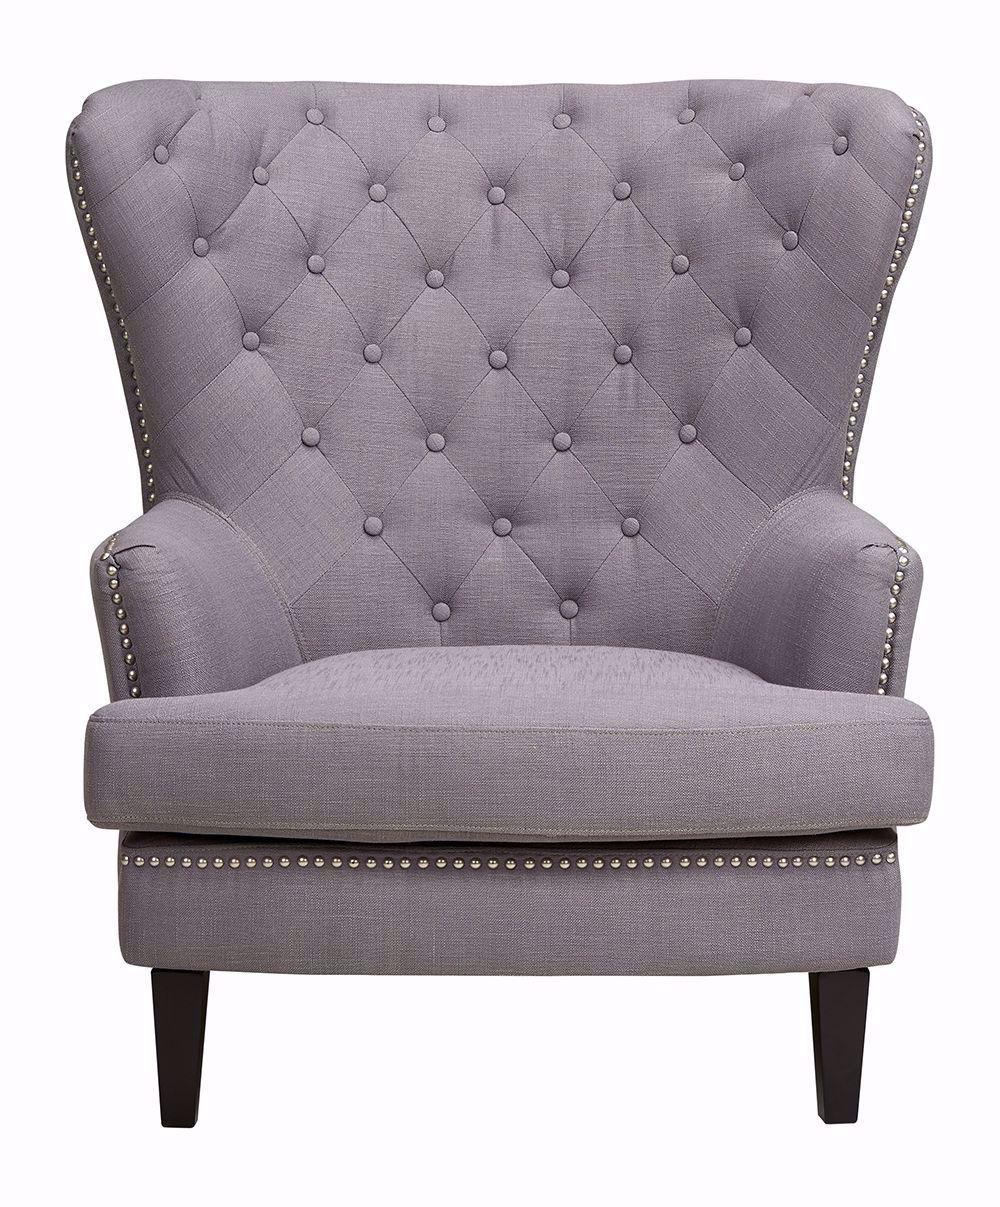 Picture of Dark Gray Linen Chair